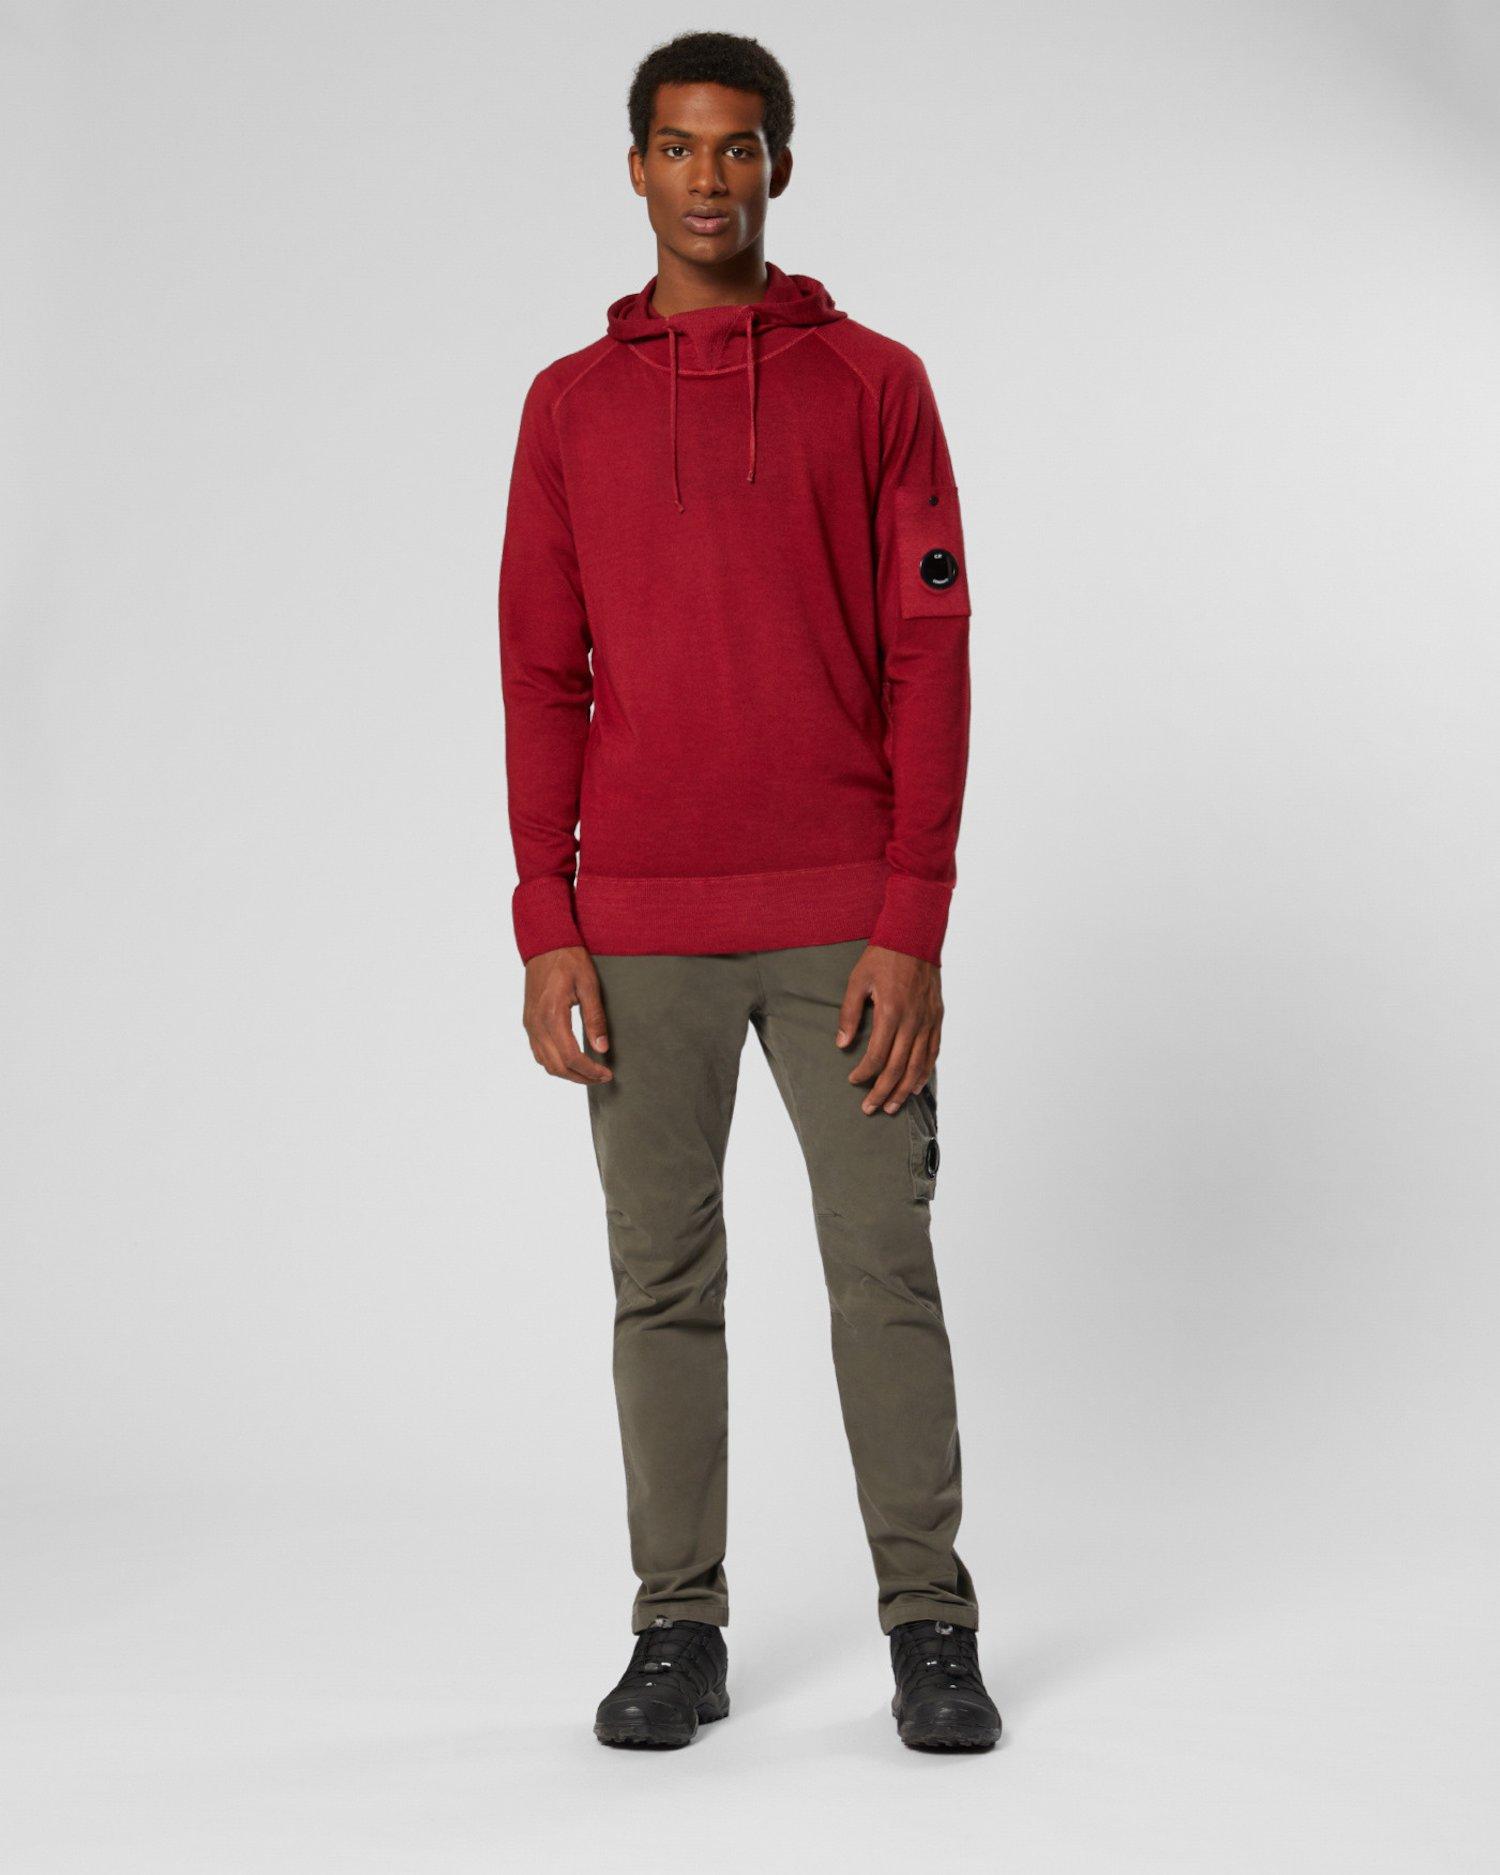 Fast Dyed Merino Hooded Sweatshirt